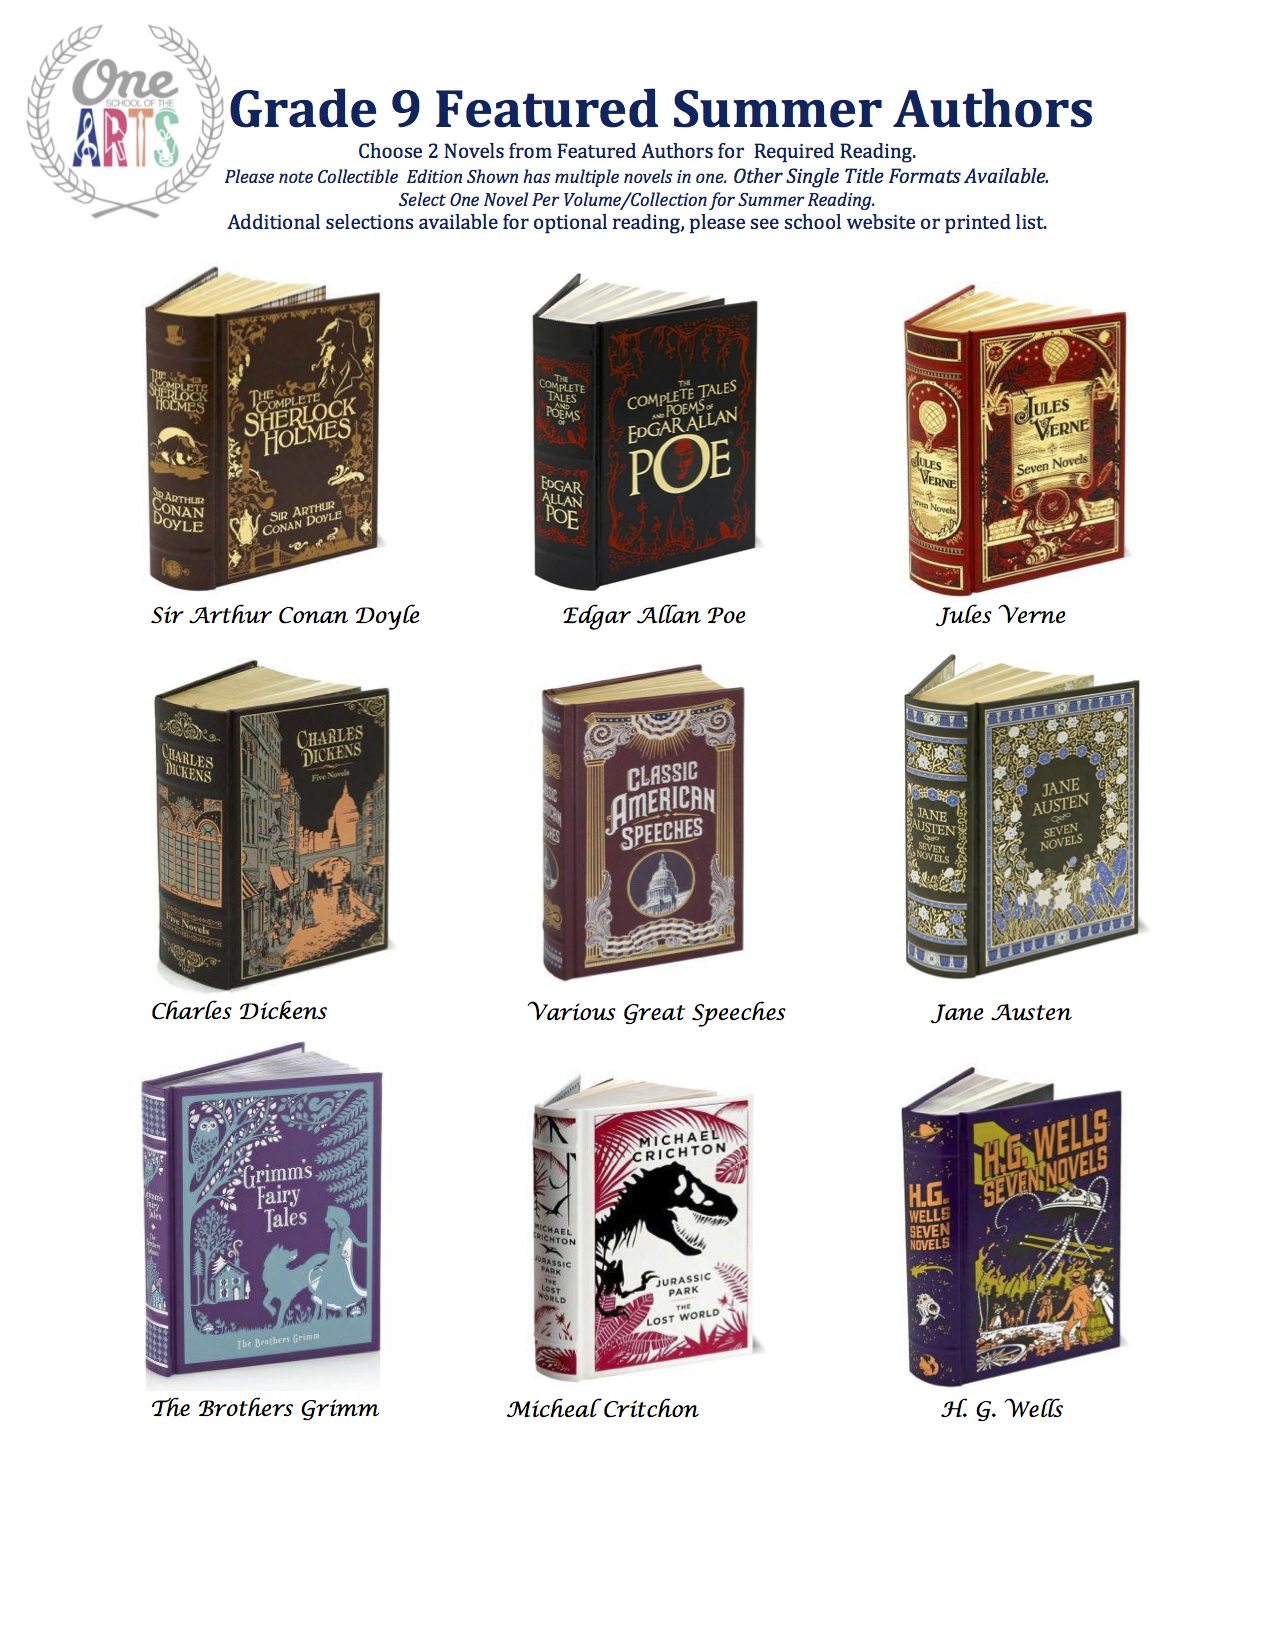 Grade 9 Featured Authors 2015.jpeg